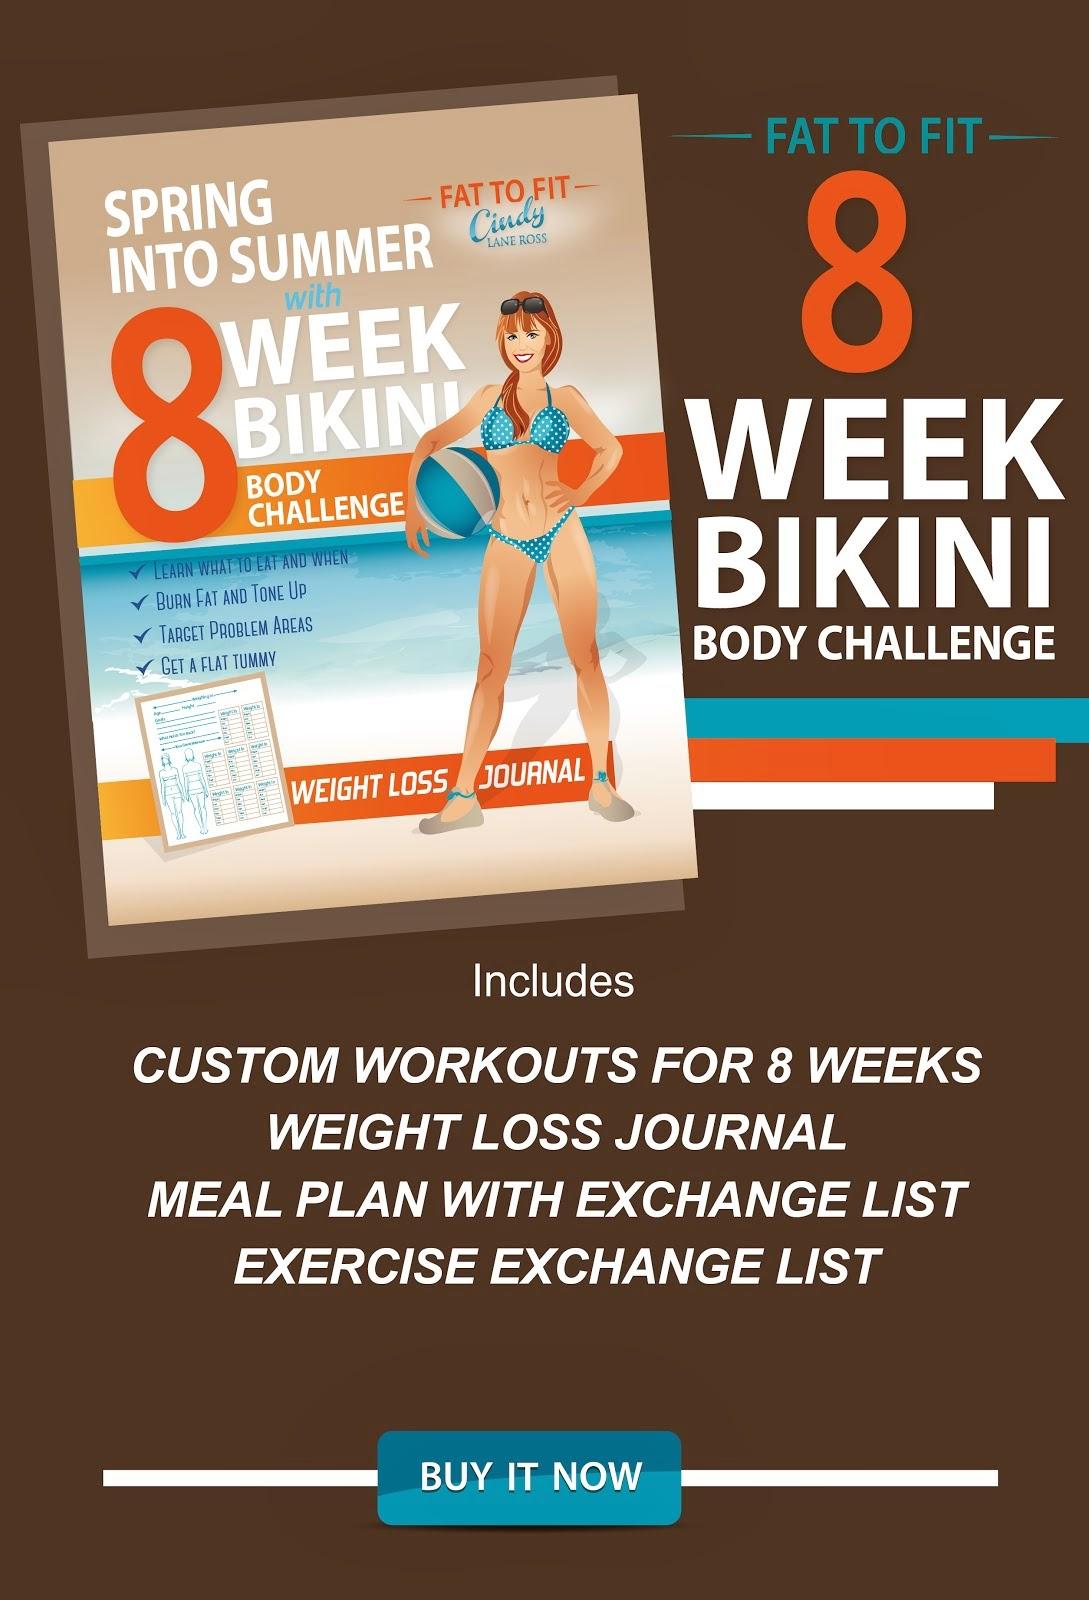 8 Week Bikini Body Challenge